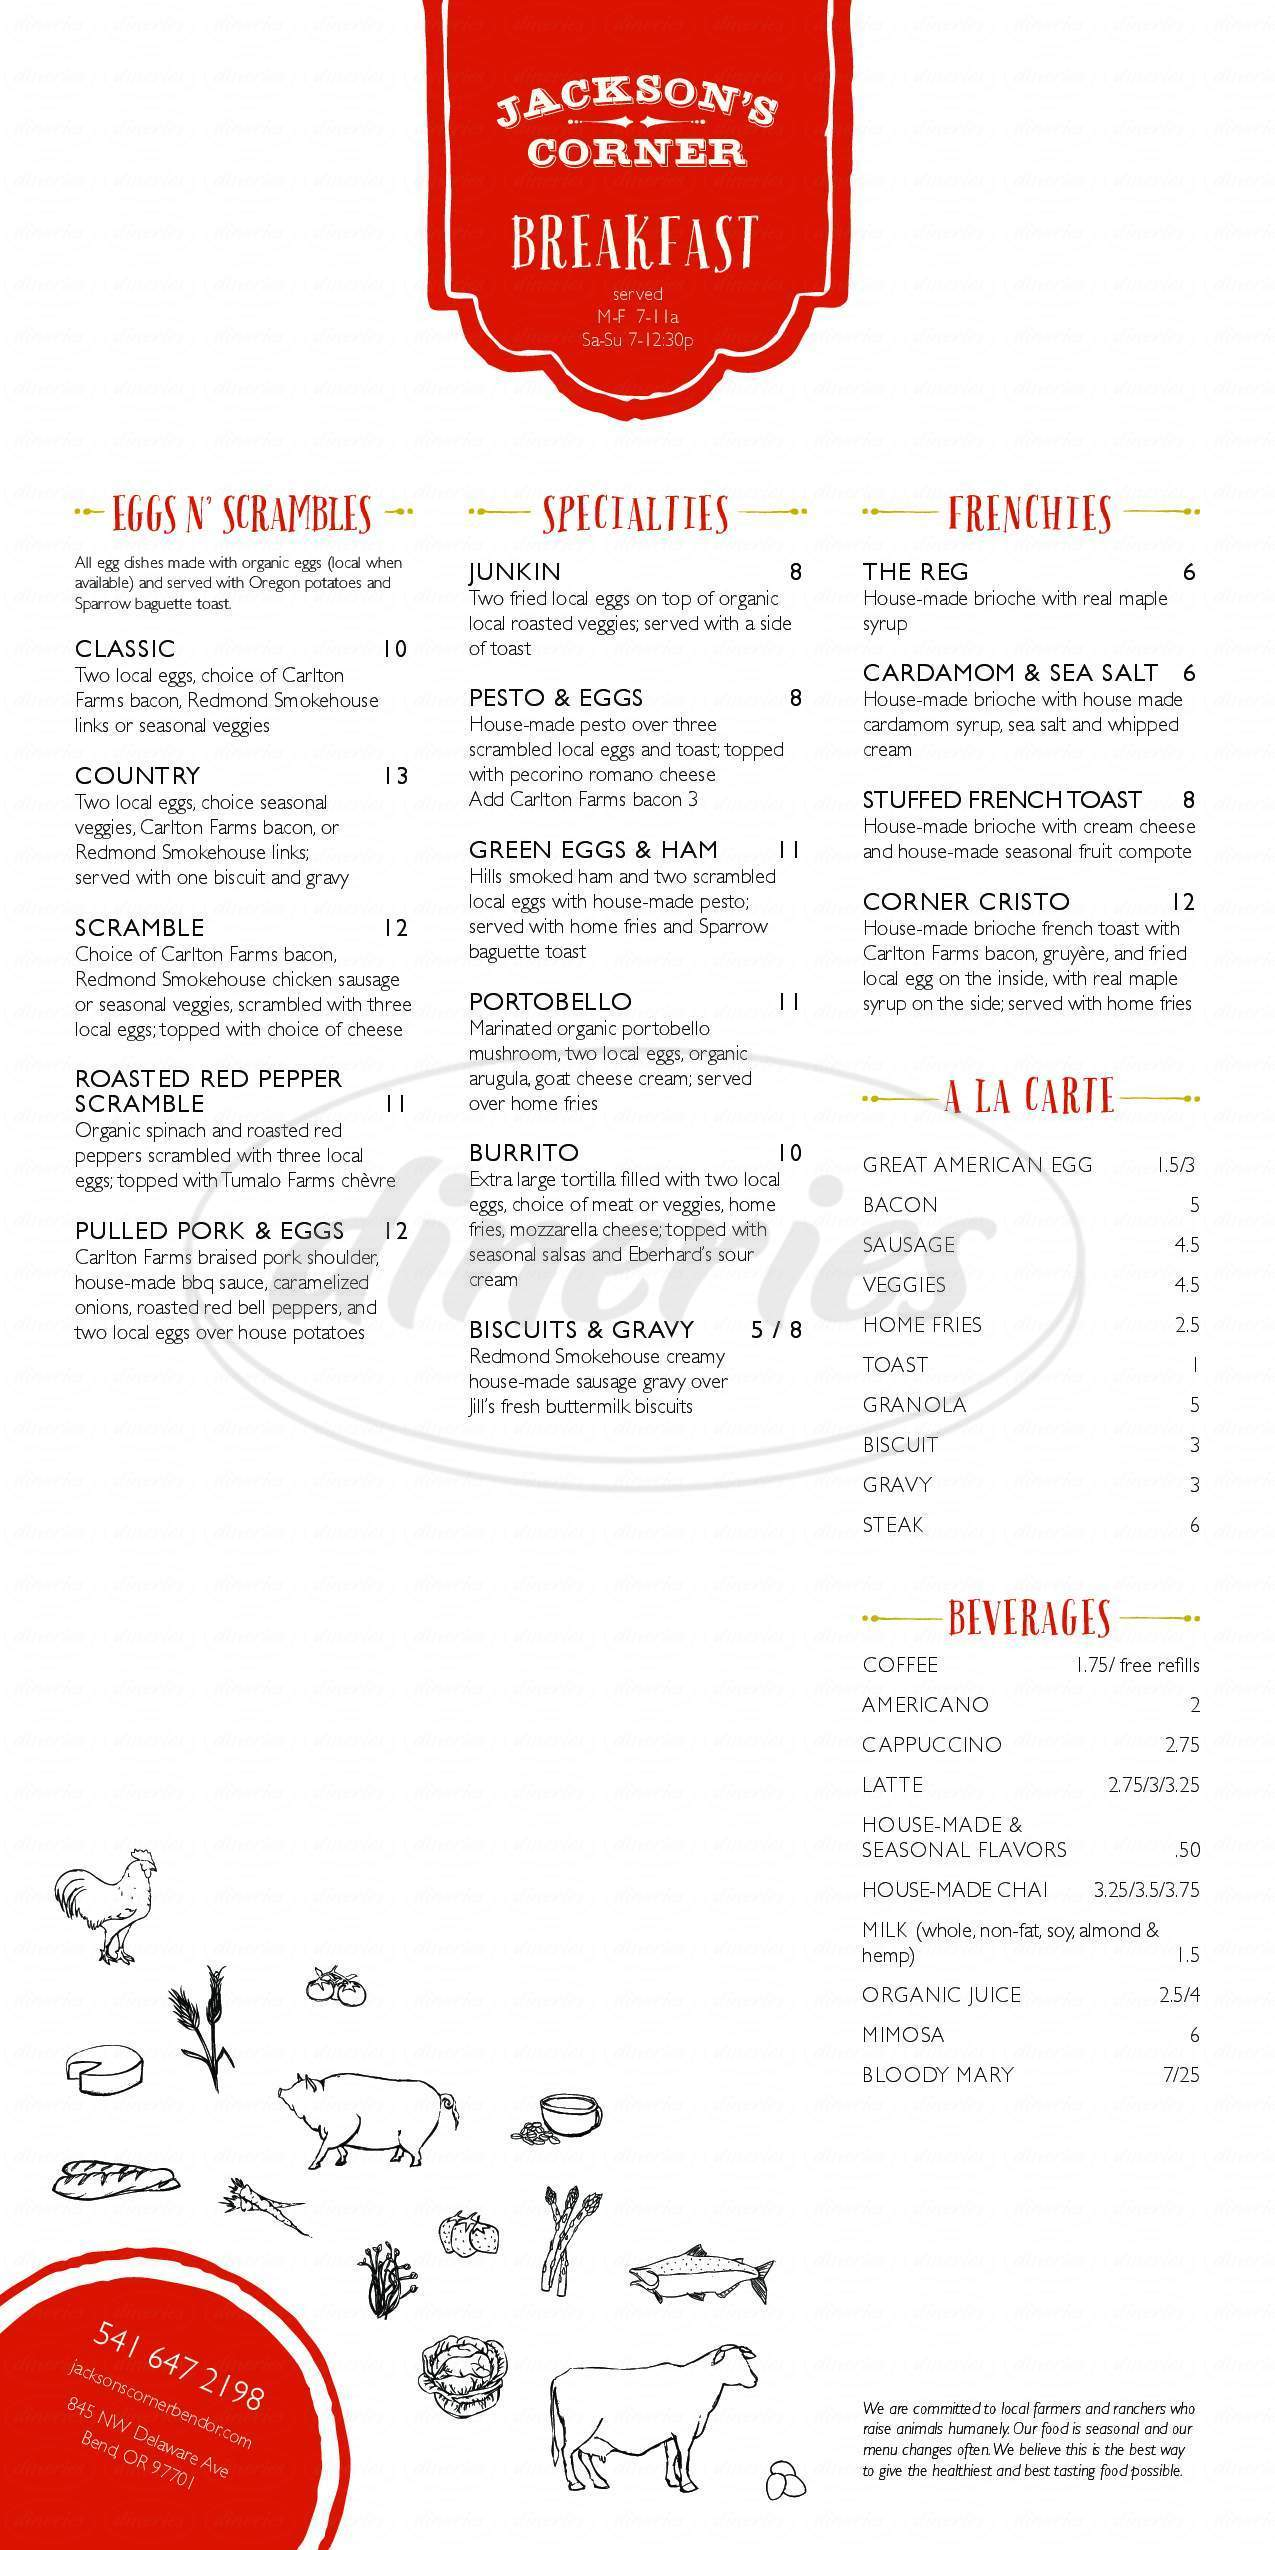 menu for Jackson's Corner